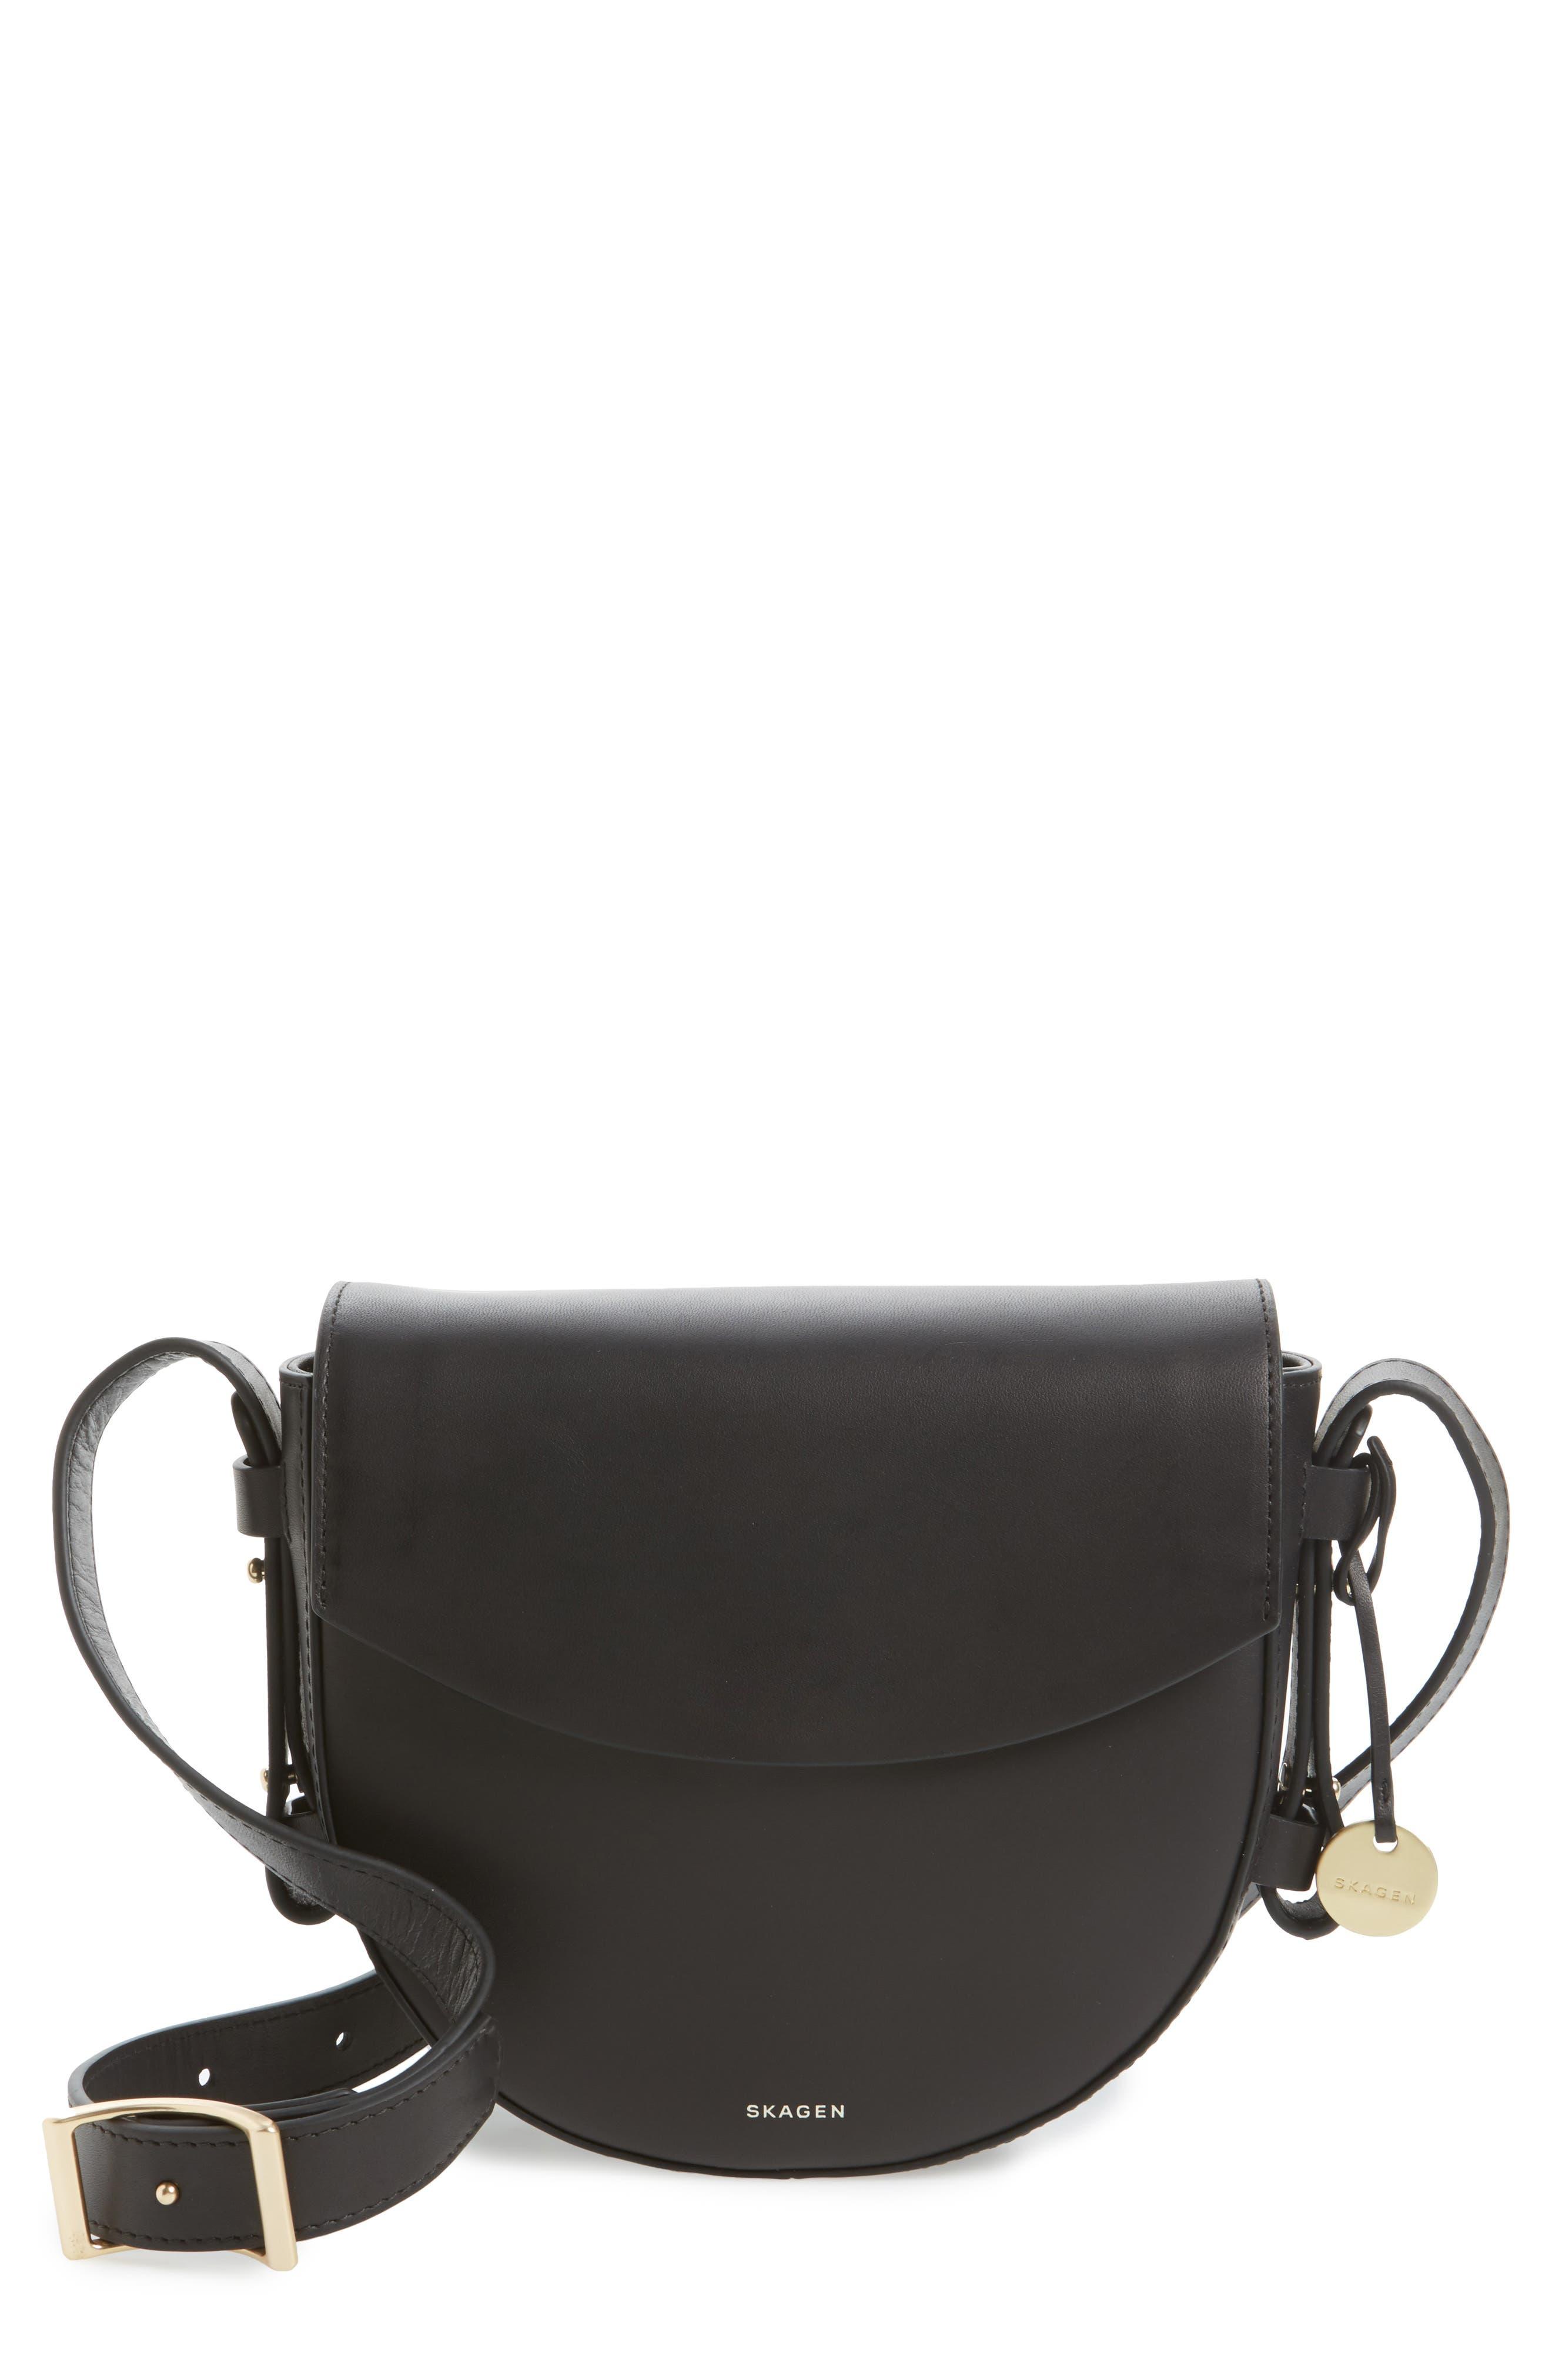 Lobelle Leather Saddle Bag,                             Main thumbnail 1, color,                             001